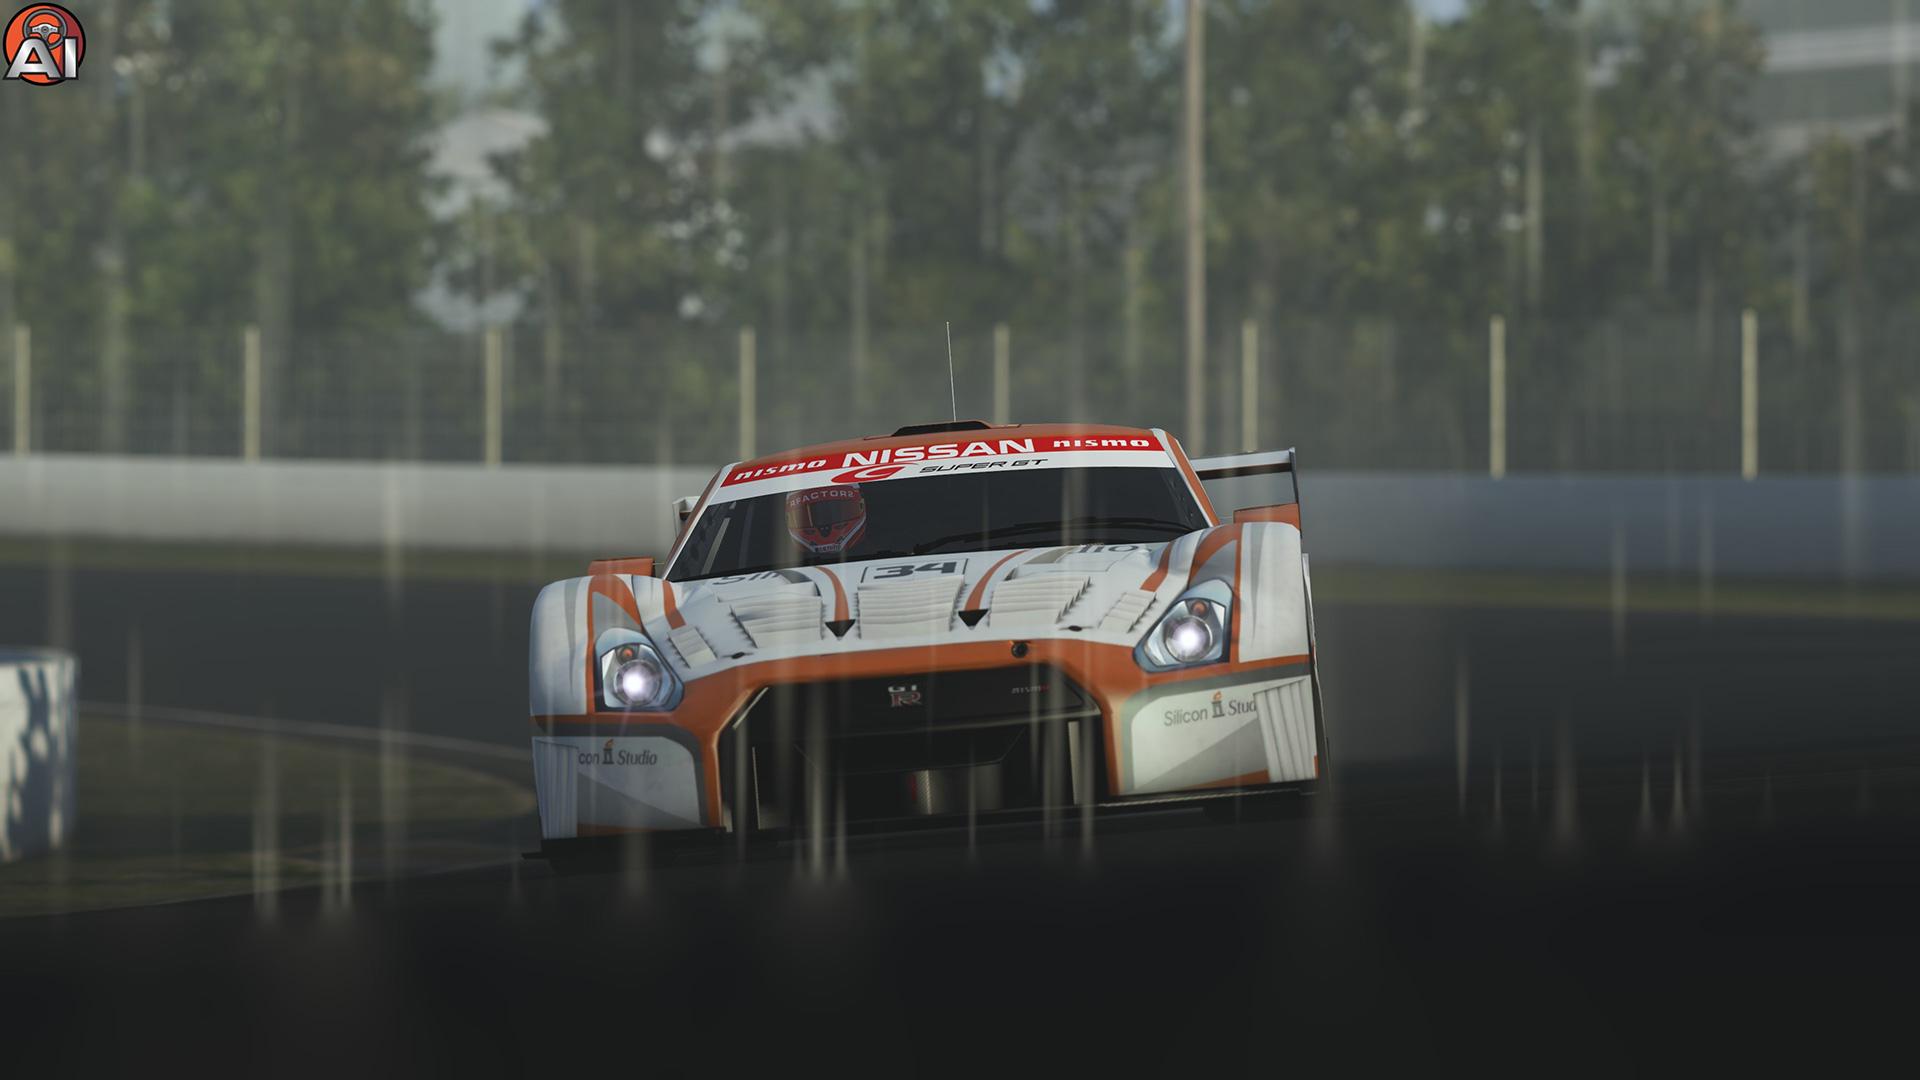 YEBIS post-effects integrated into groundbreaking racing simulator